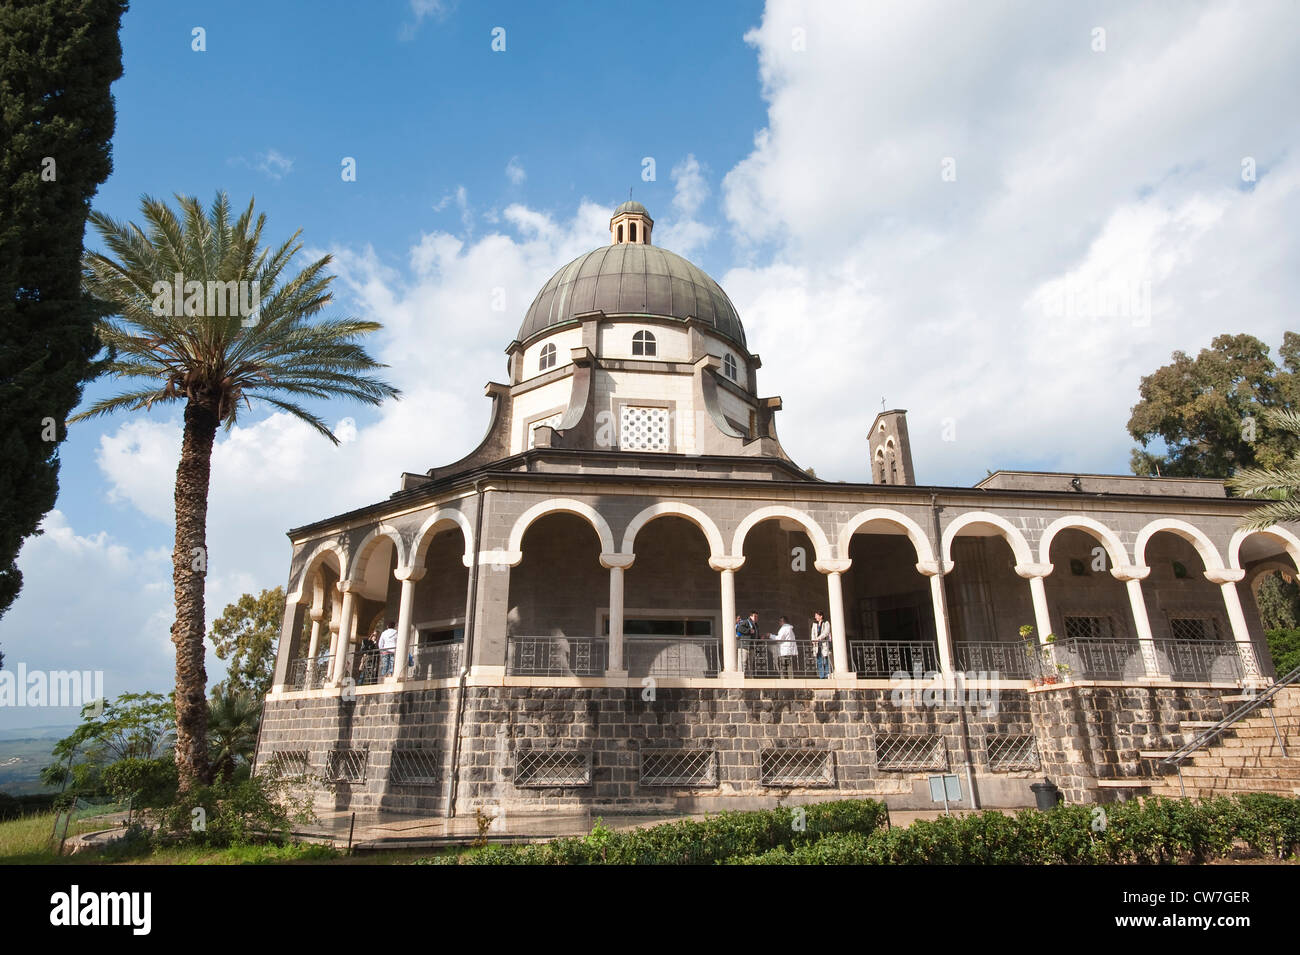 Mount of Beatitudes Church, Israel Stock Photo